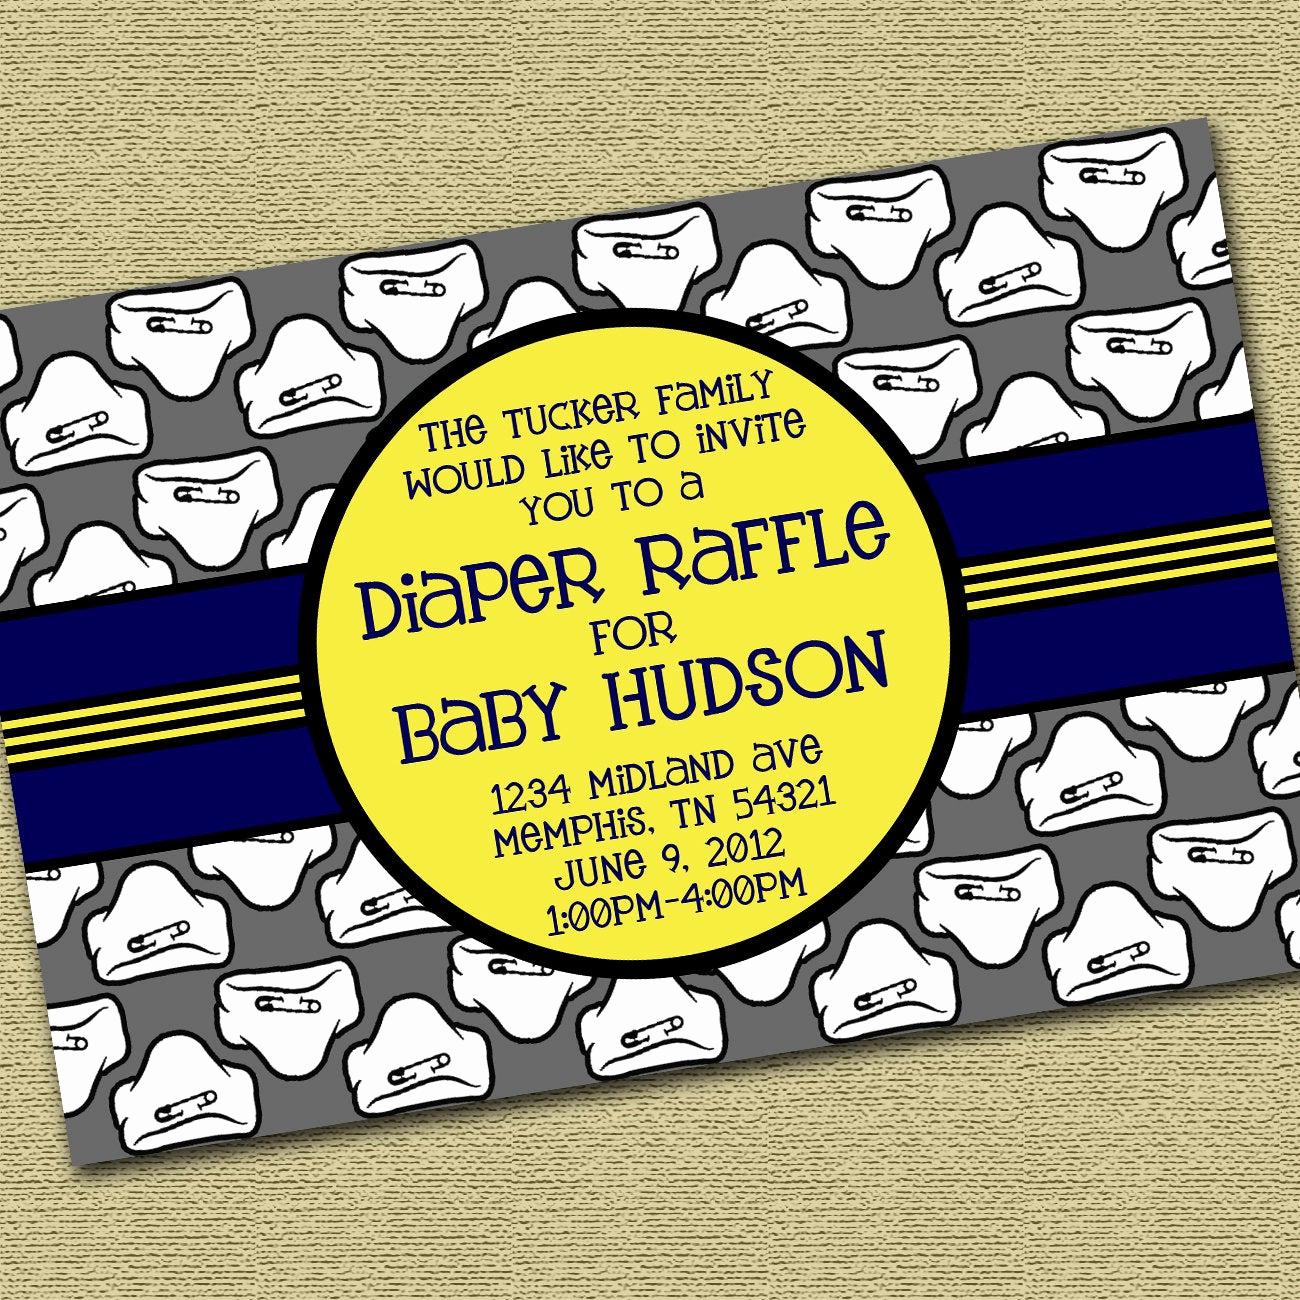 Diaper Raffle Wording On Invitation Luxury Diaper Raffle Baby Shower Invitation Package by 3casastudios